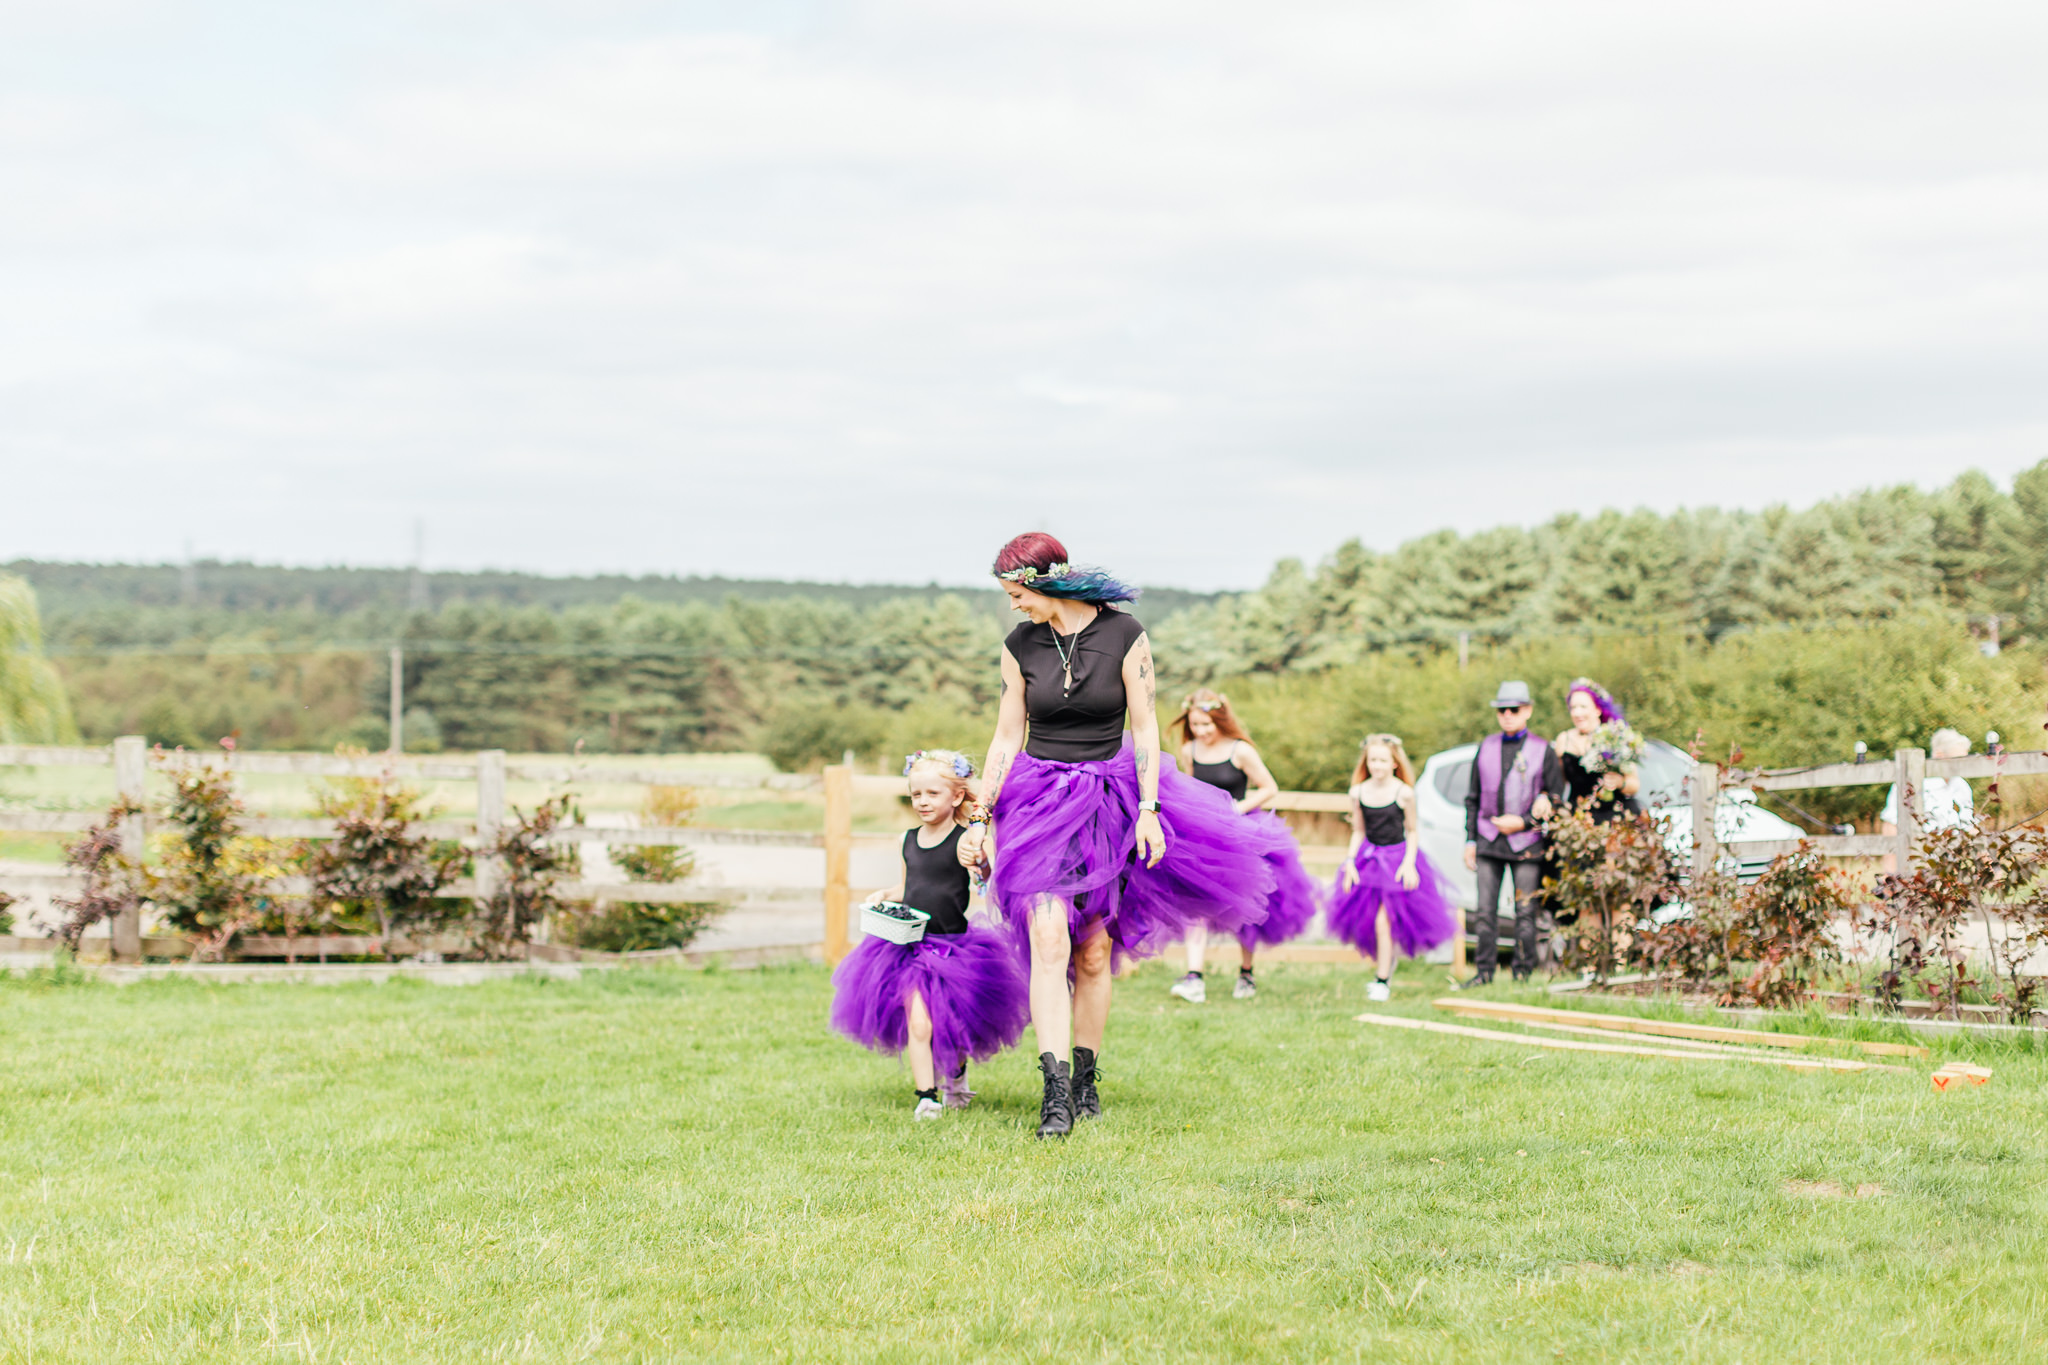 Inkersall-grange-farm-wedding-16.jpg